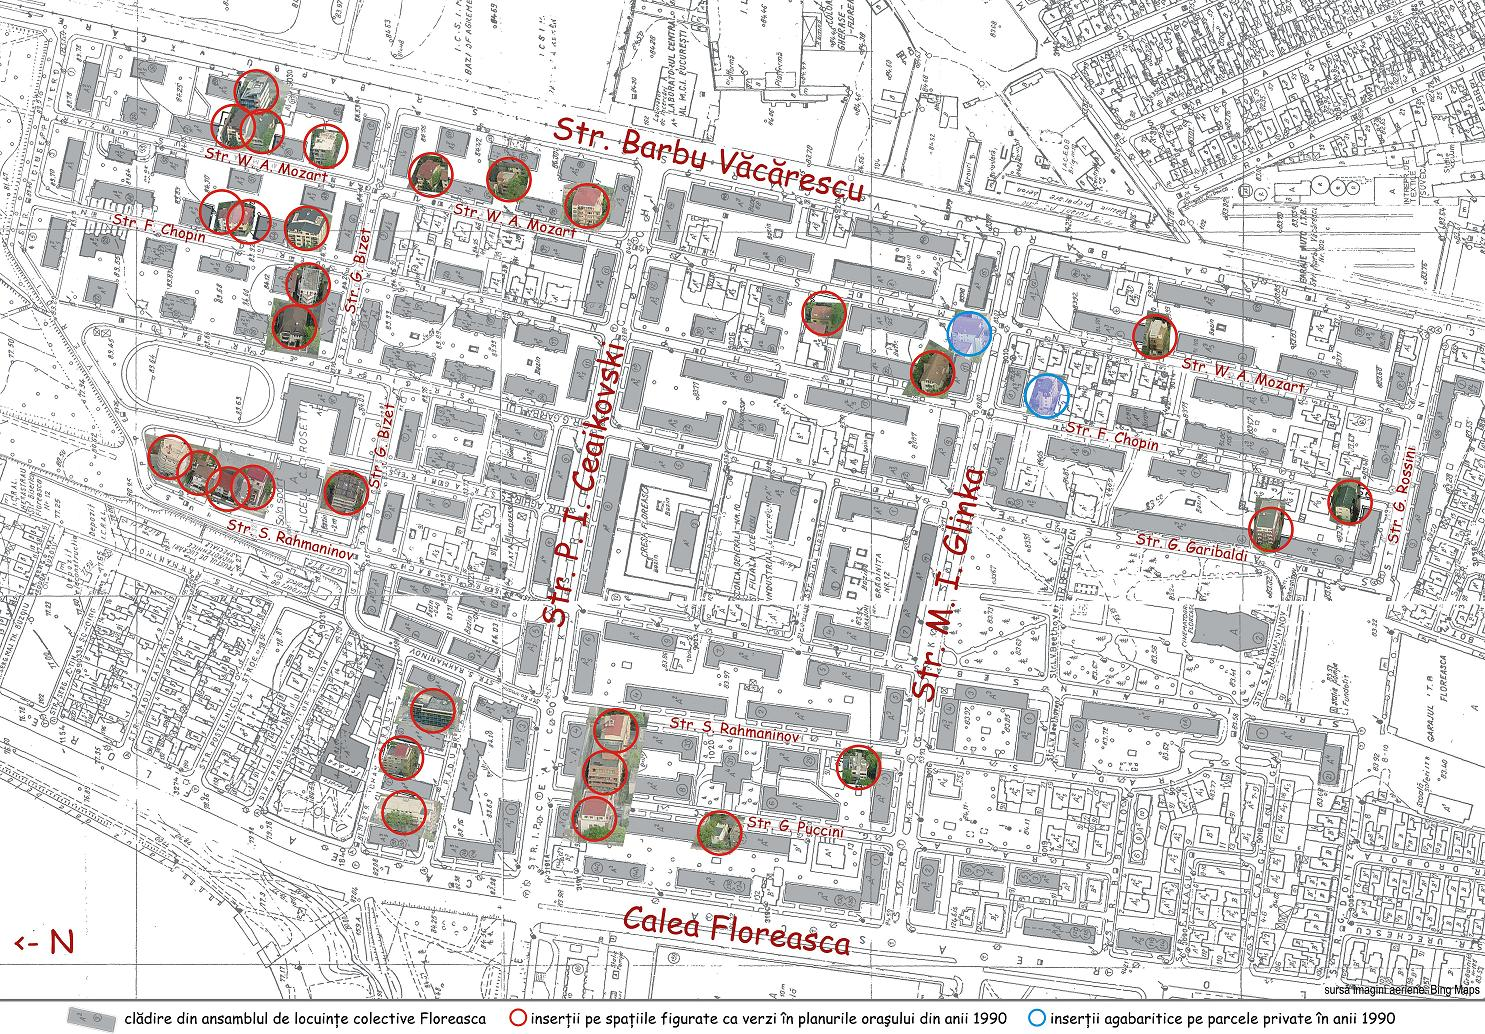 Floreasca site plan